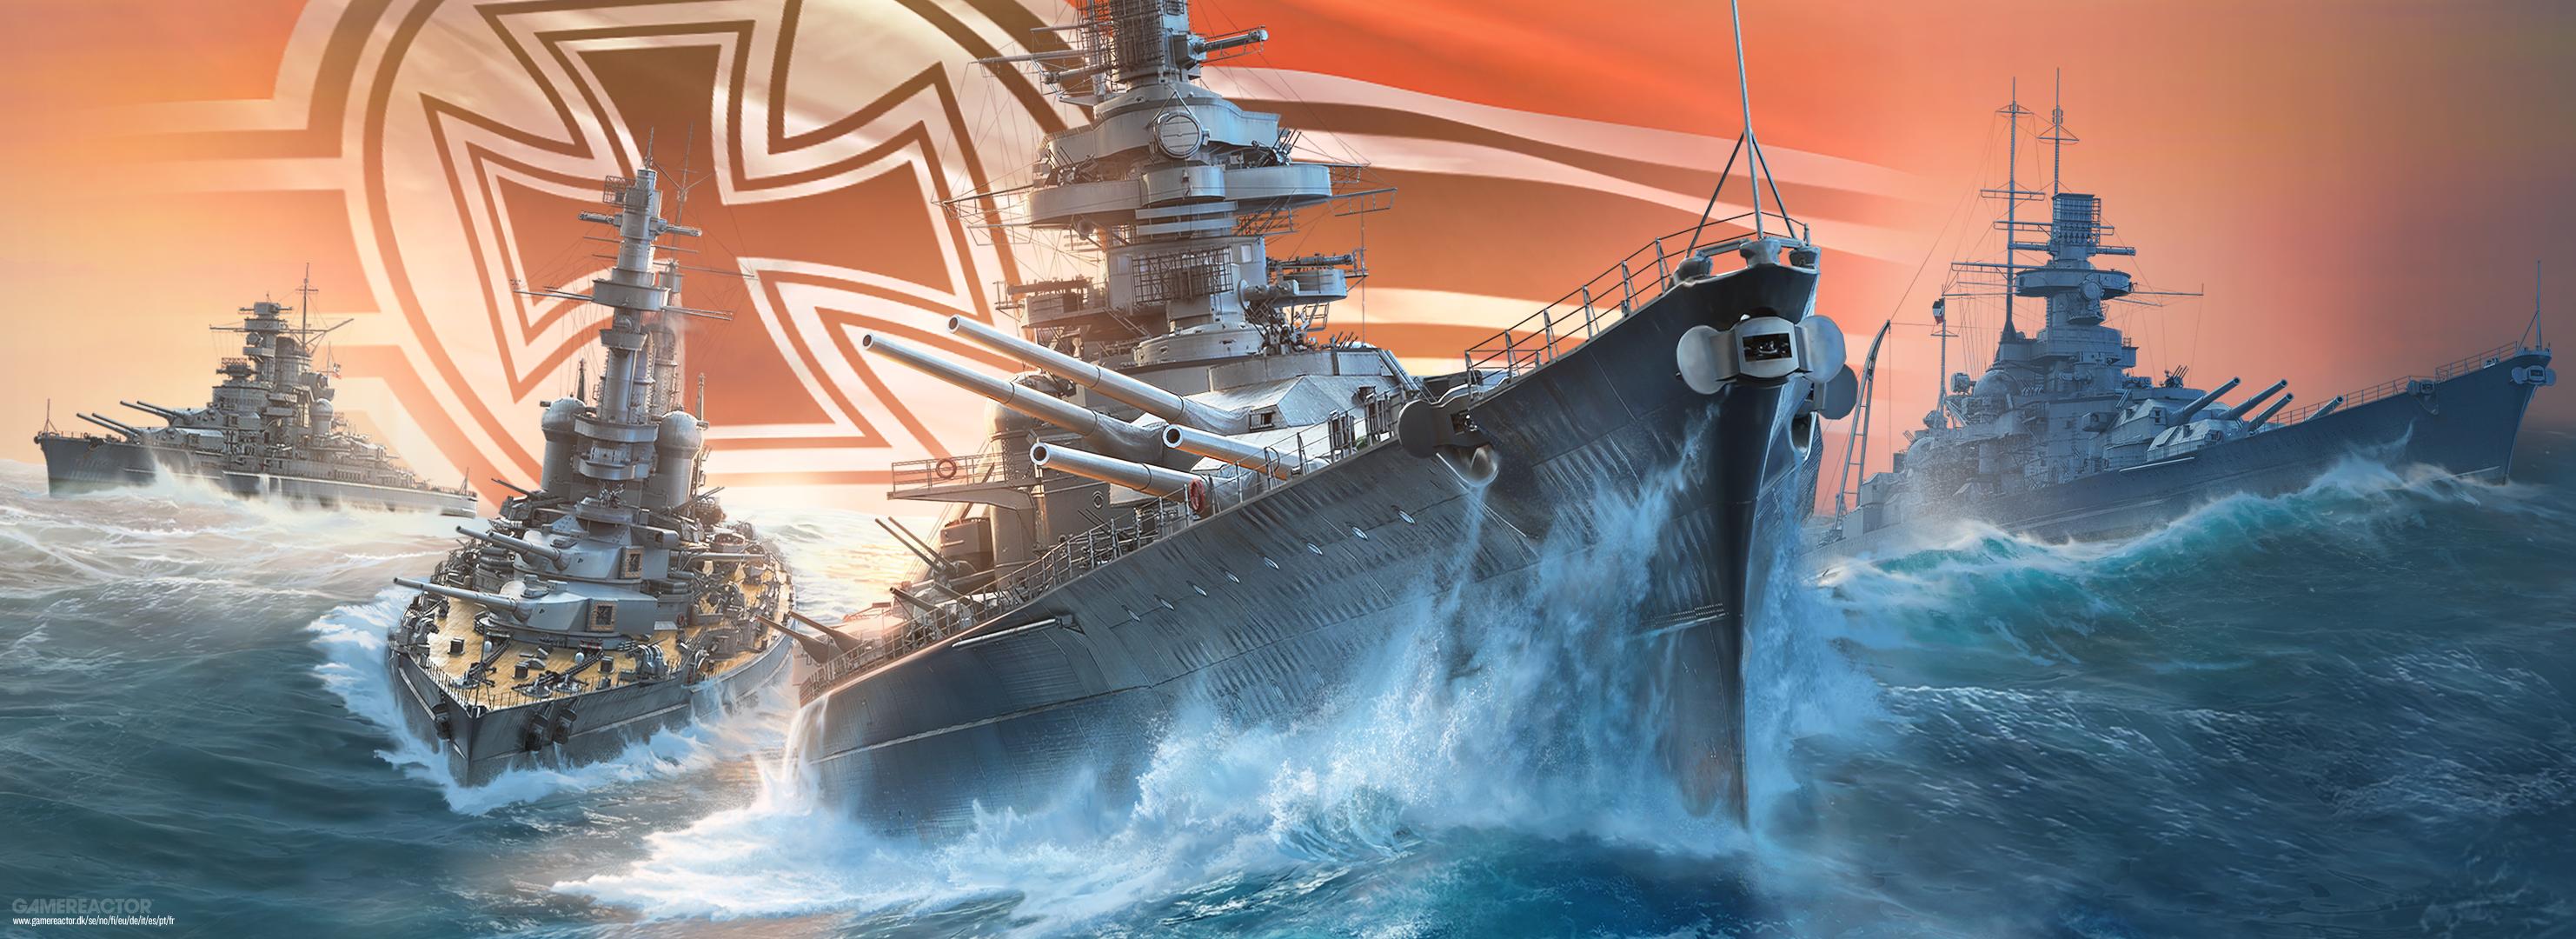 German battleships invade World of Warships Blitz